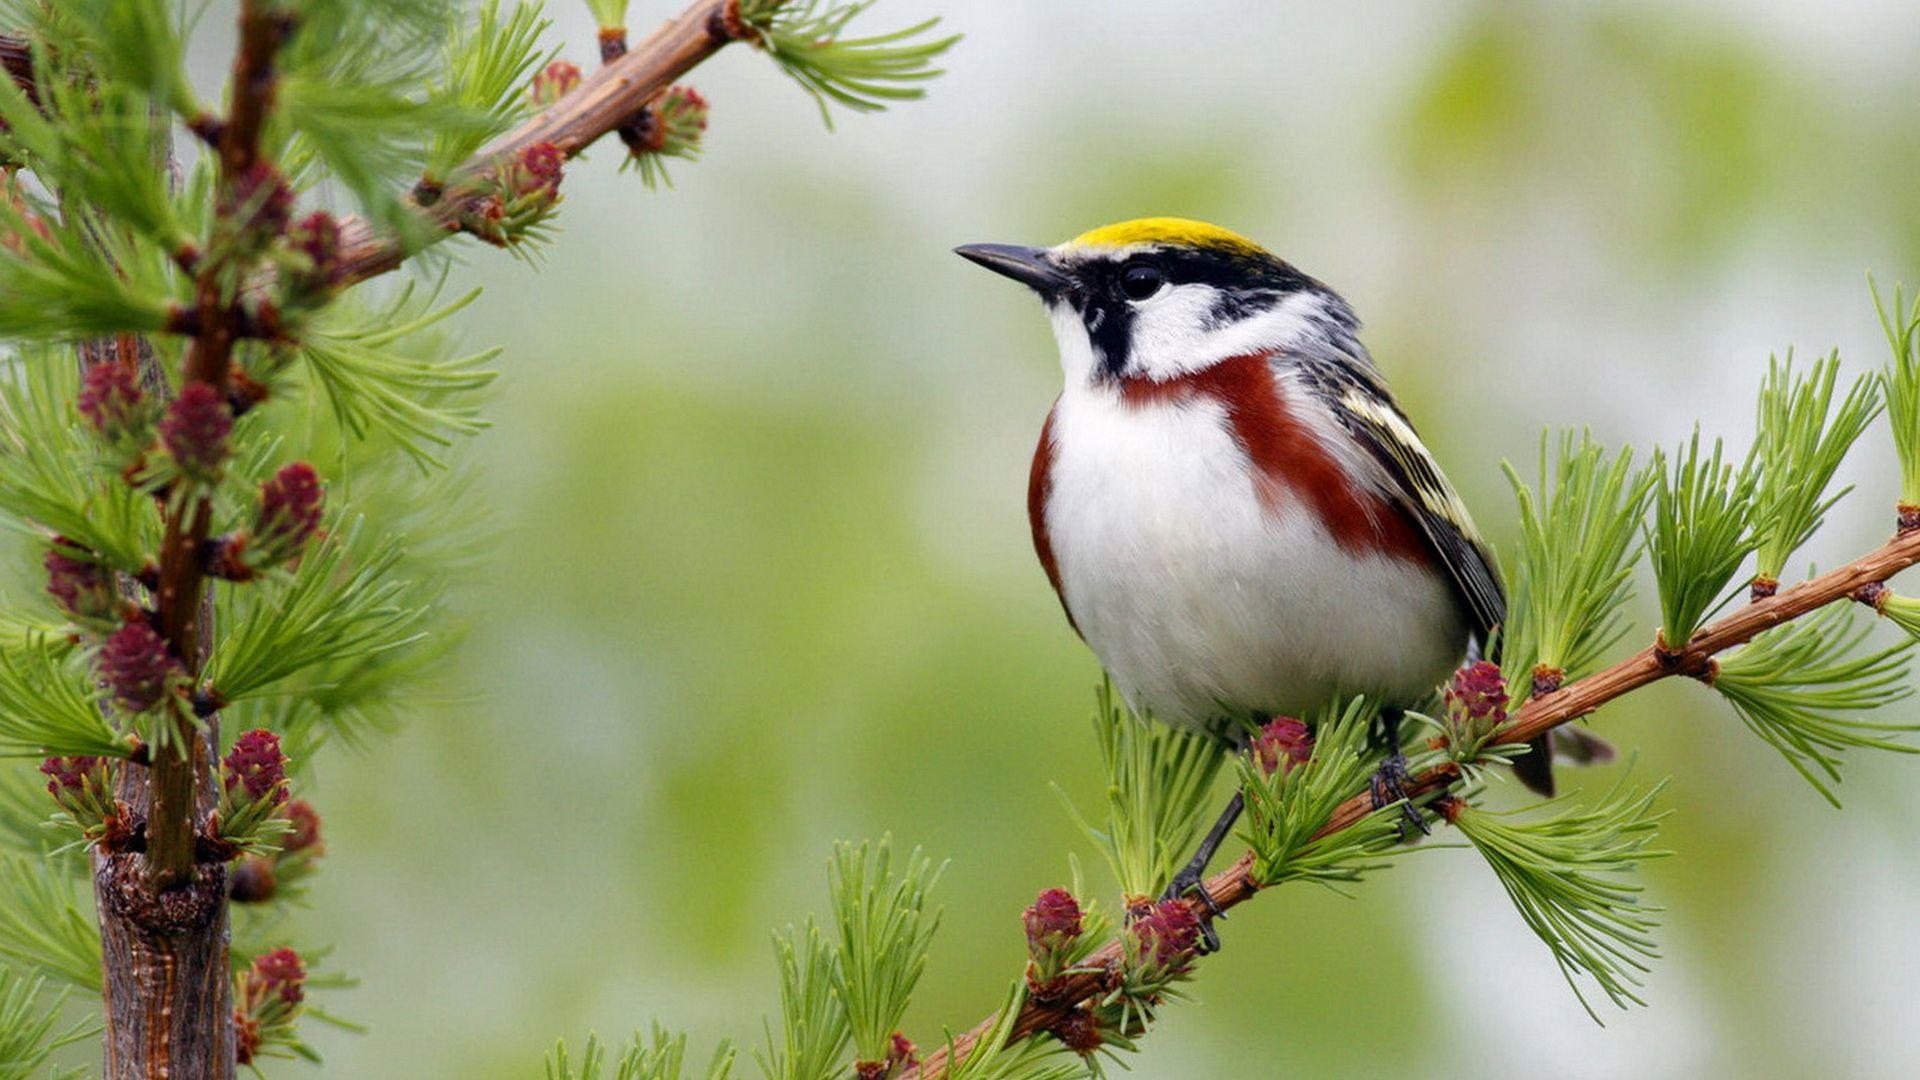 Bird On Branch Photos